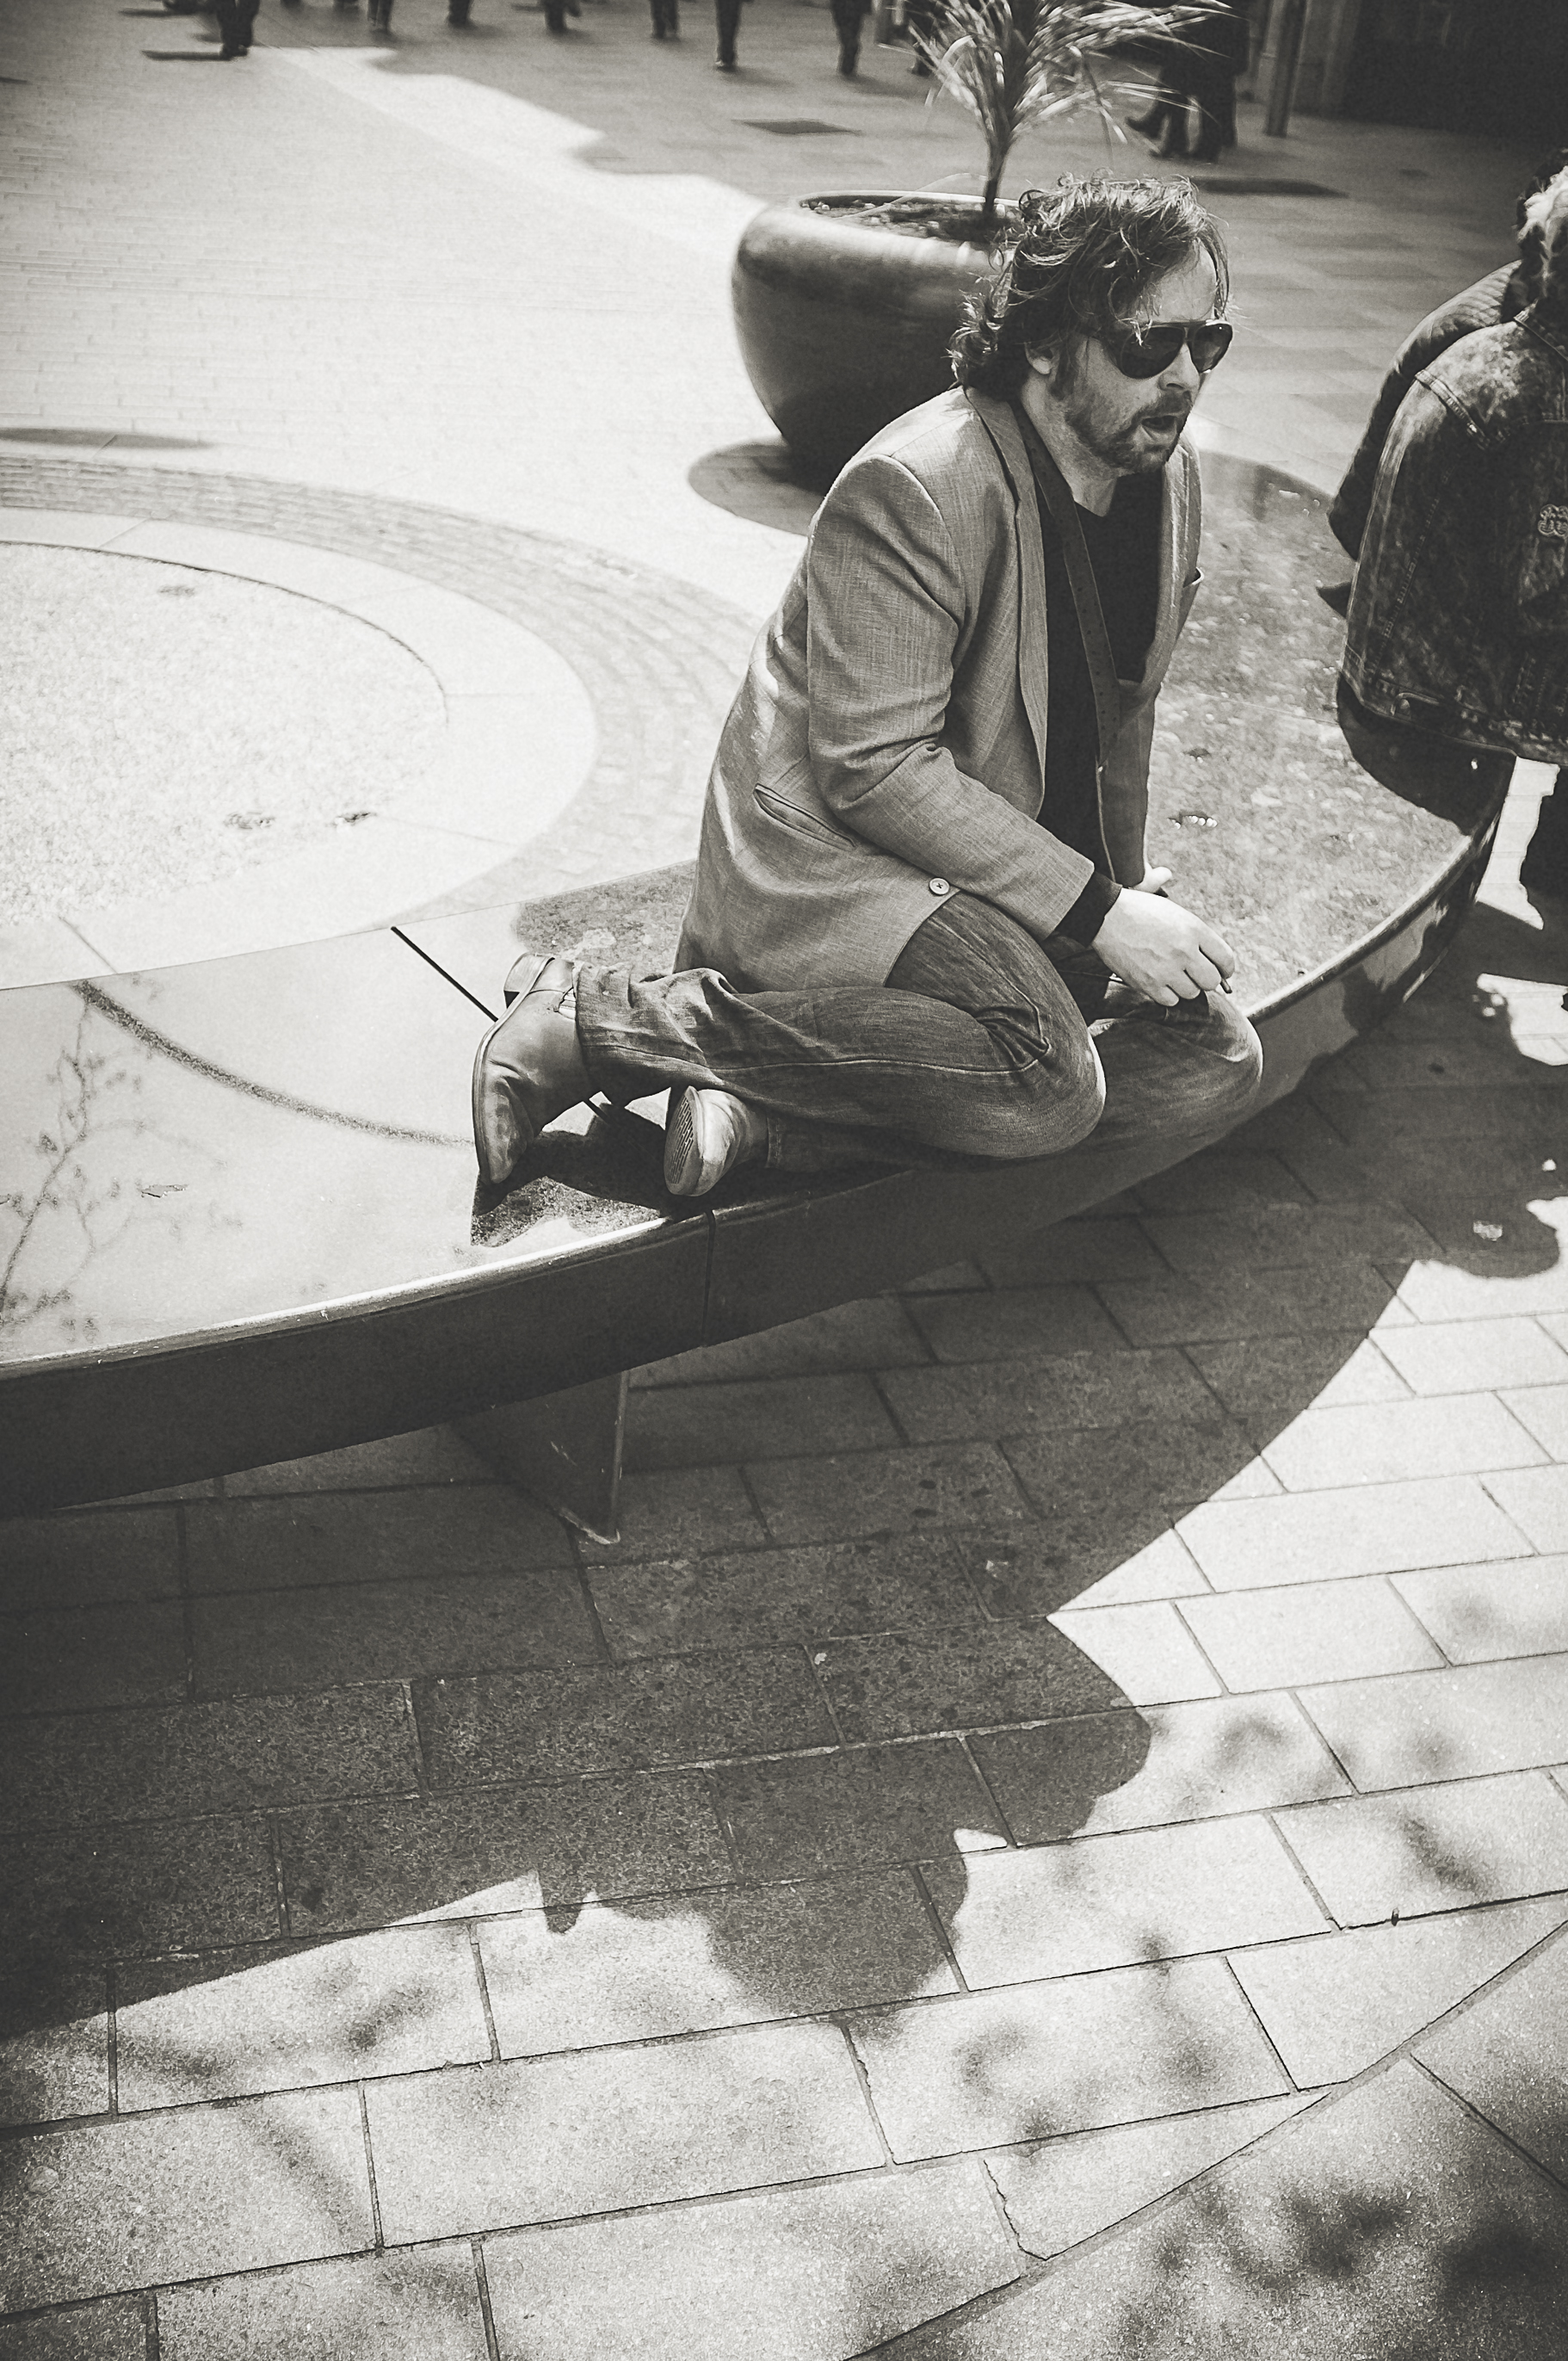 cardiff_street_photography_with_the_fuji_x100-18.jpg